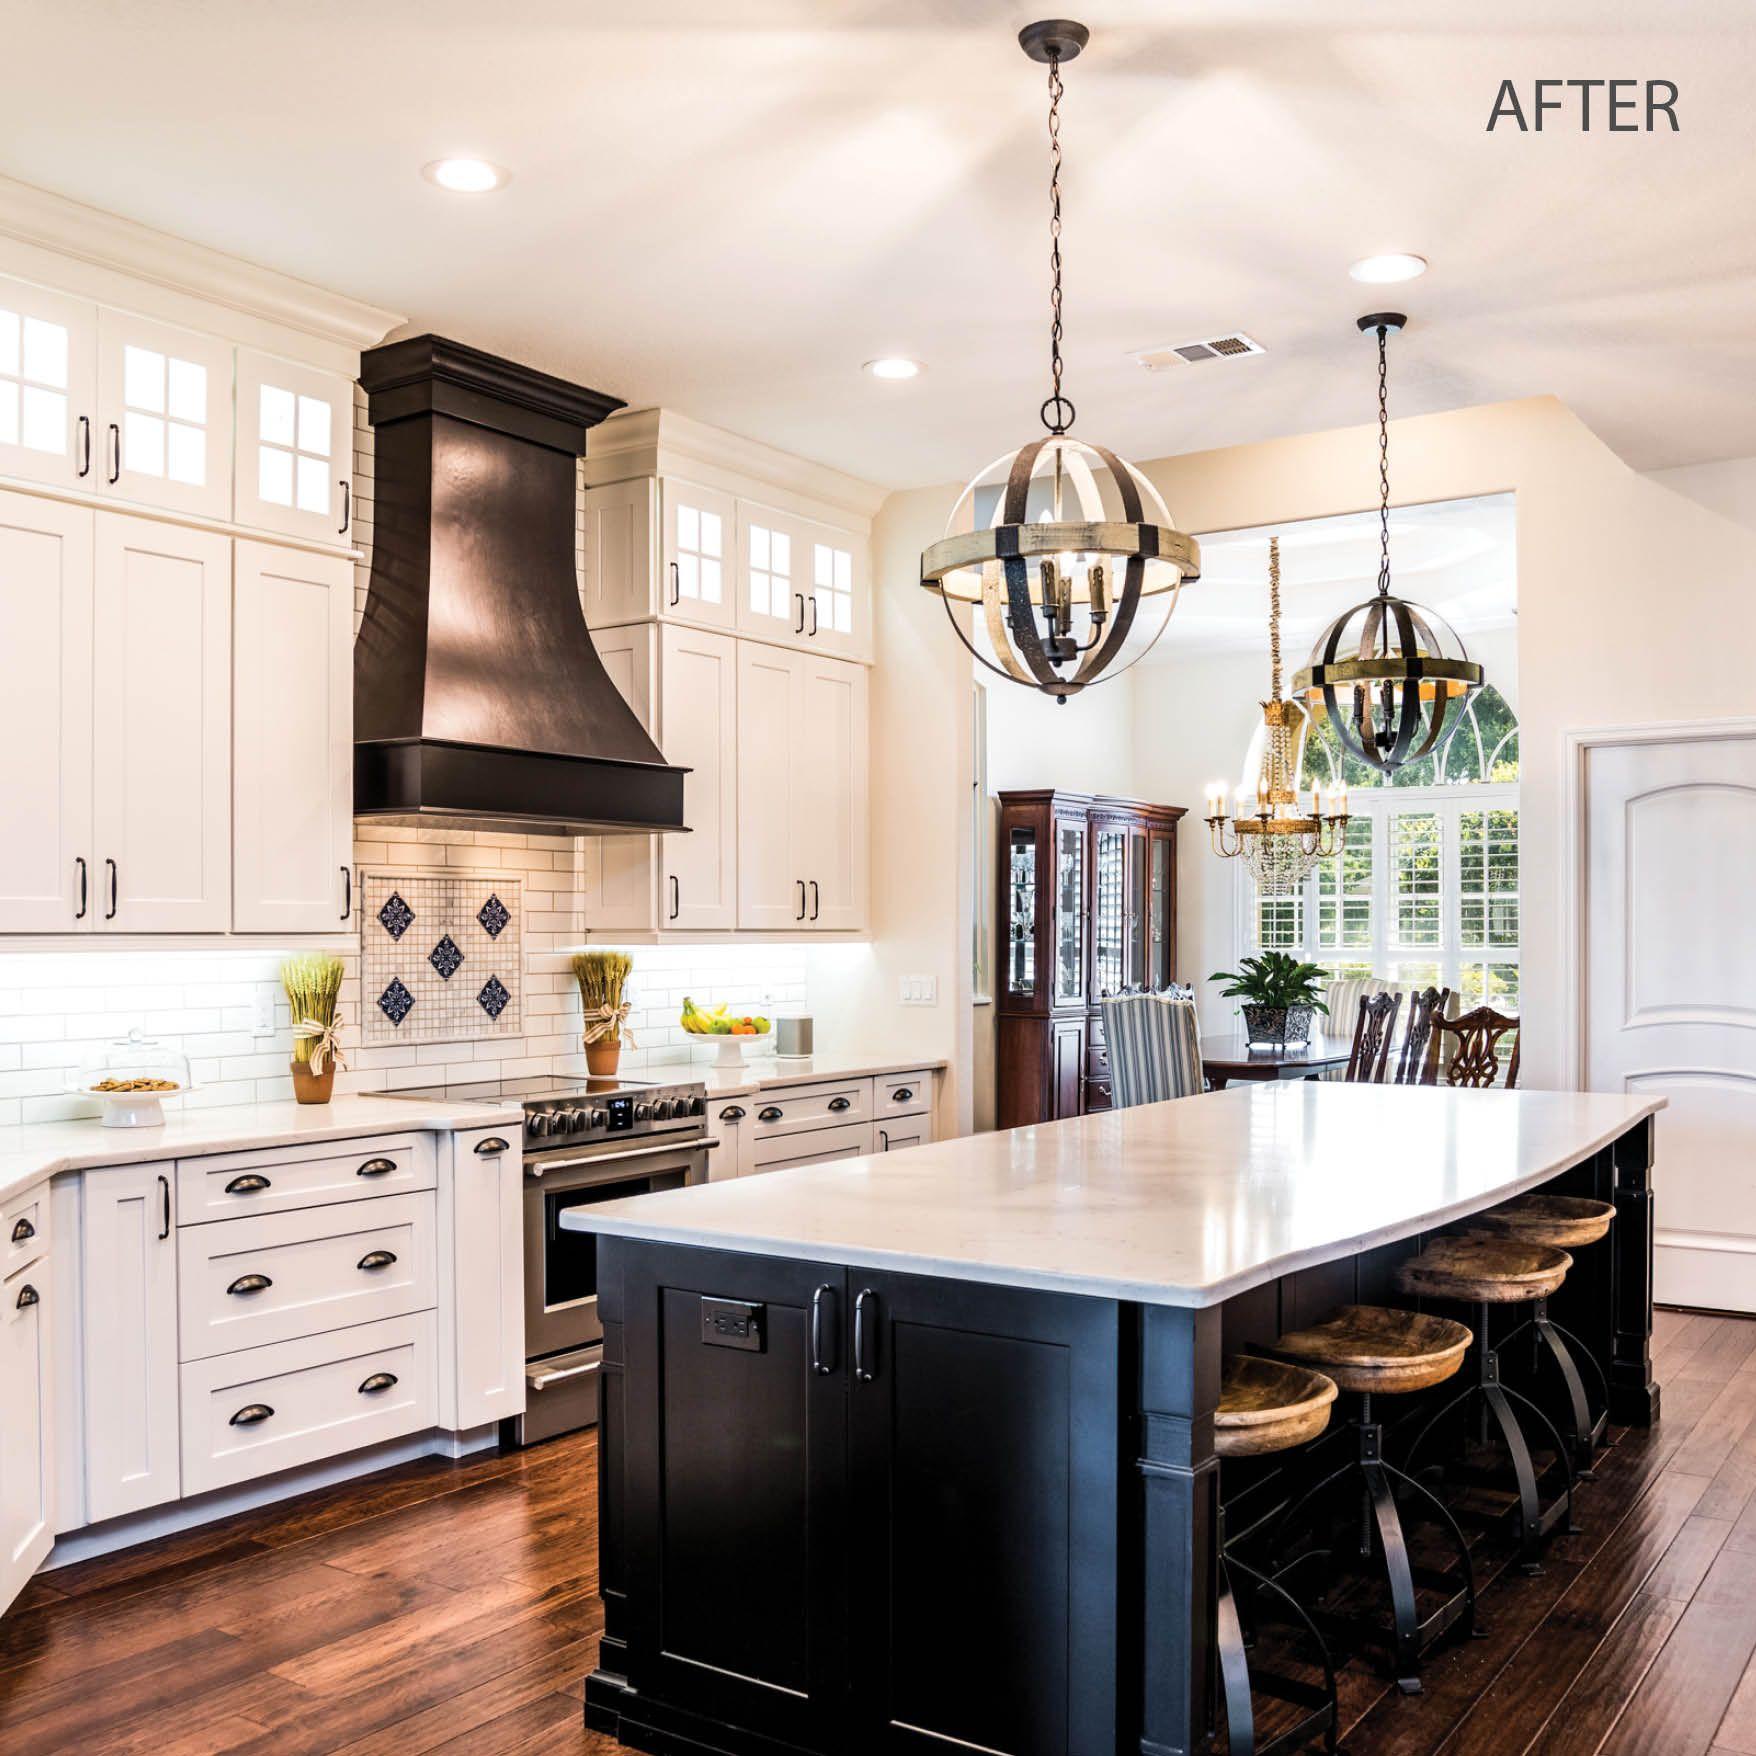 Lodge Decor In Home Decor Small Kitchen Decorating Ideas Colors Vintage Kitchen Decor Kitchen Appliances Luxury Latest Kitchen Designs